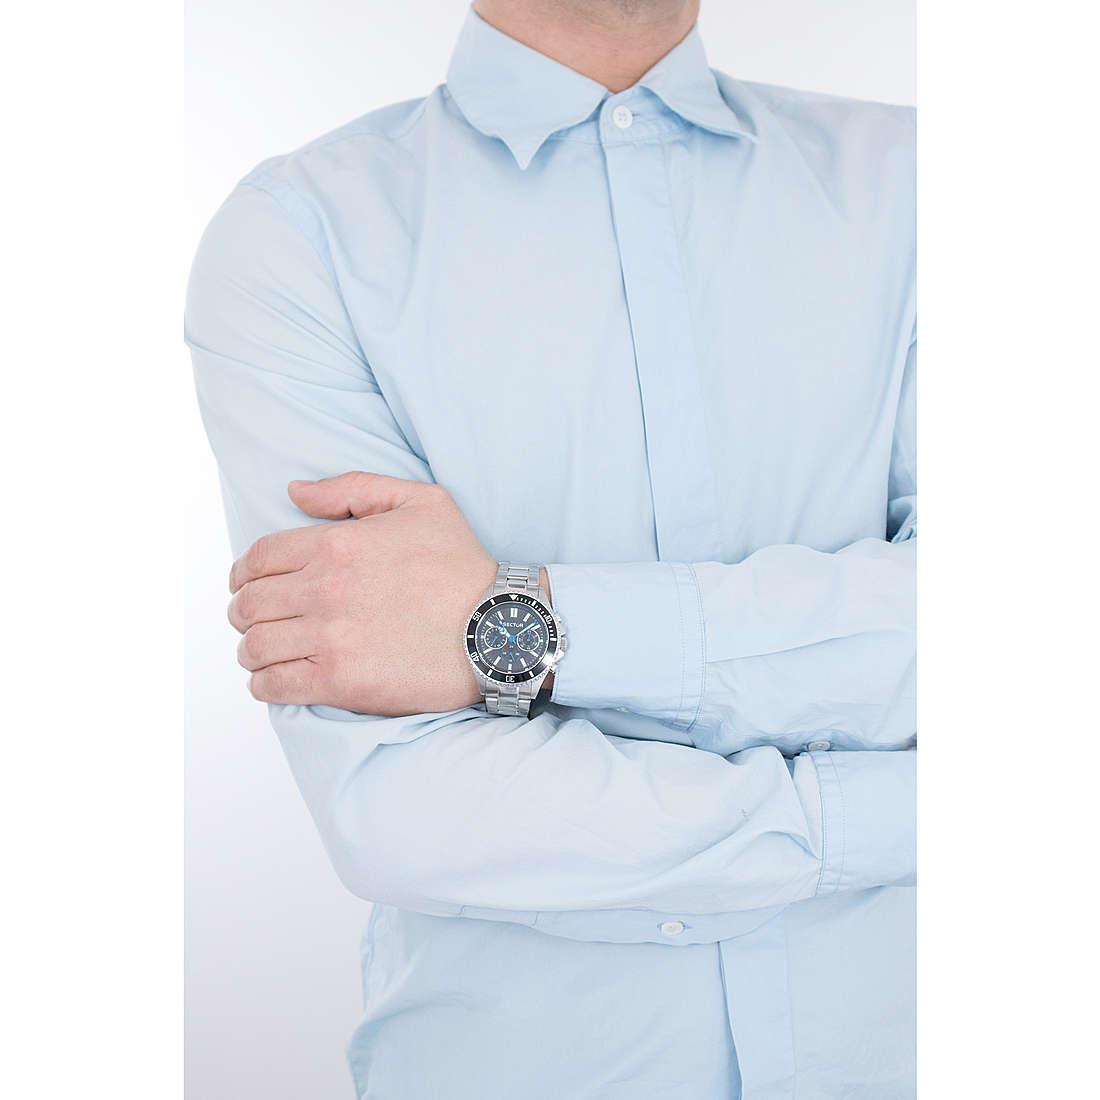 Sector cronografi 235 uomo R3253161007 indosso